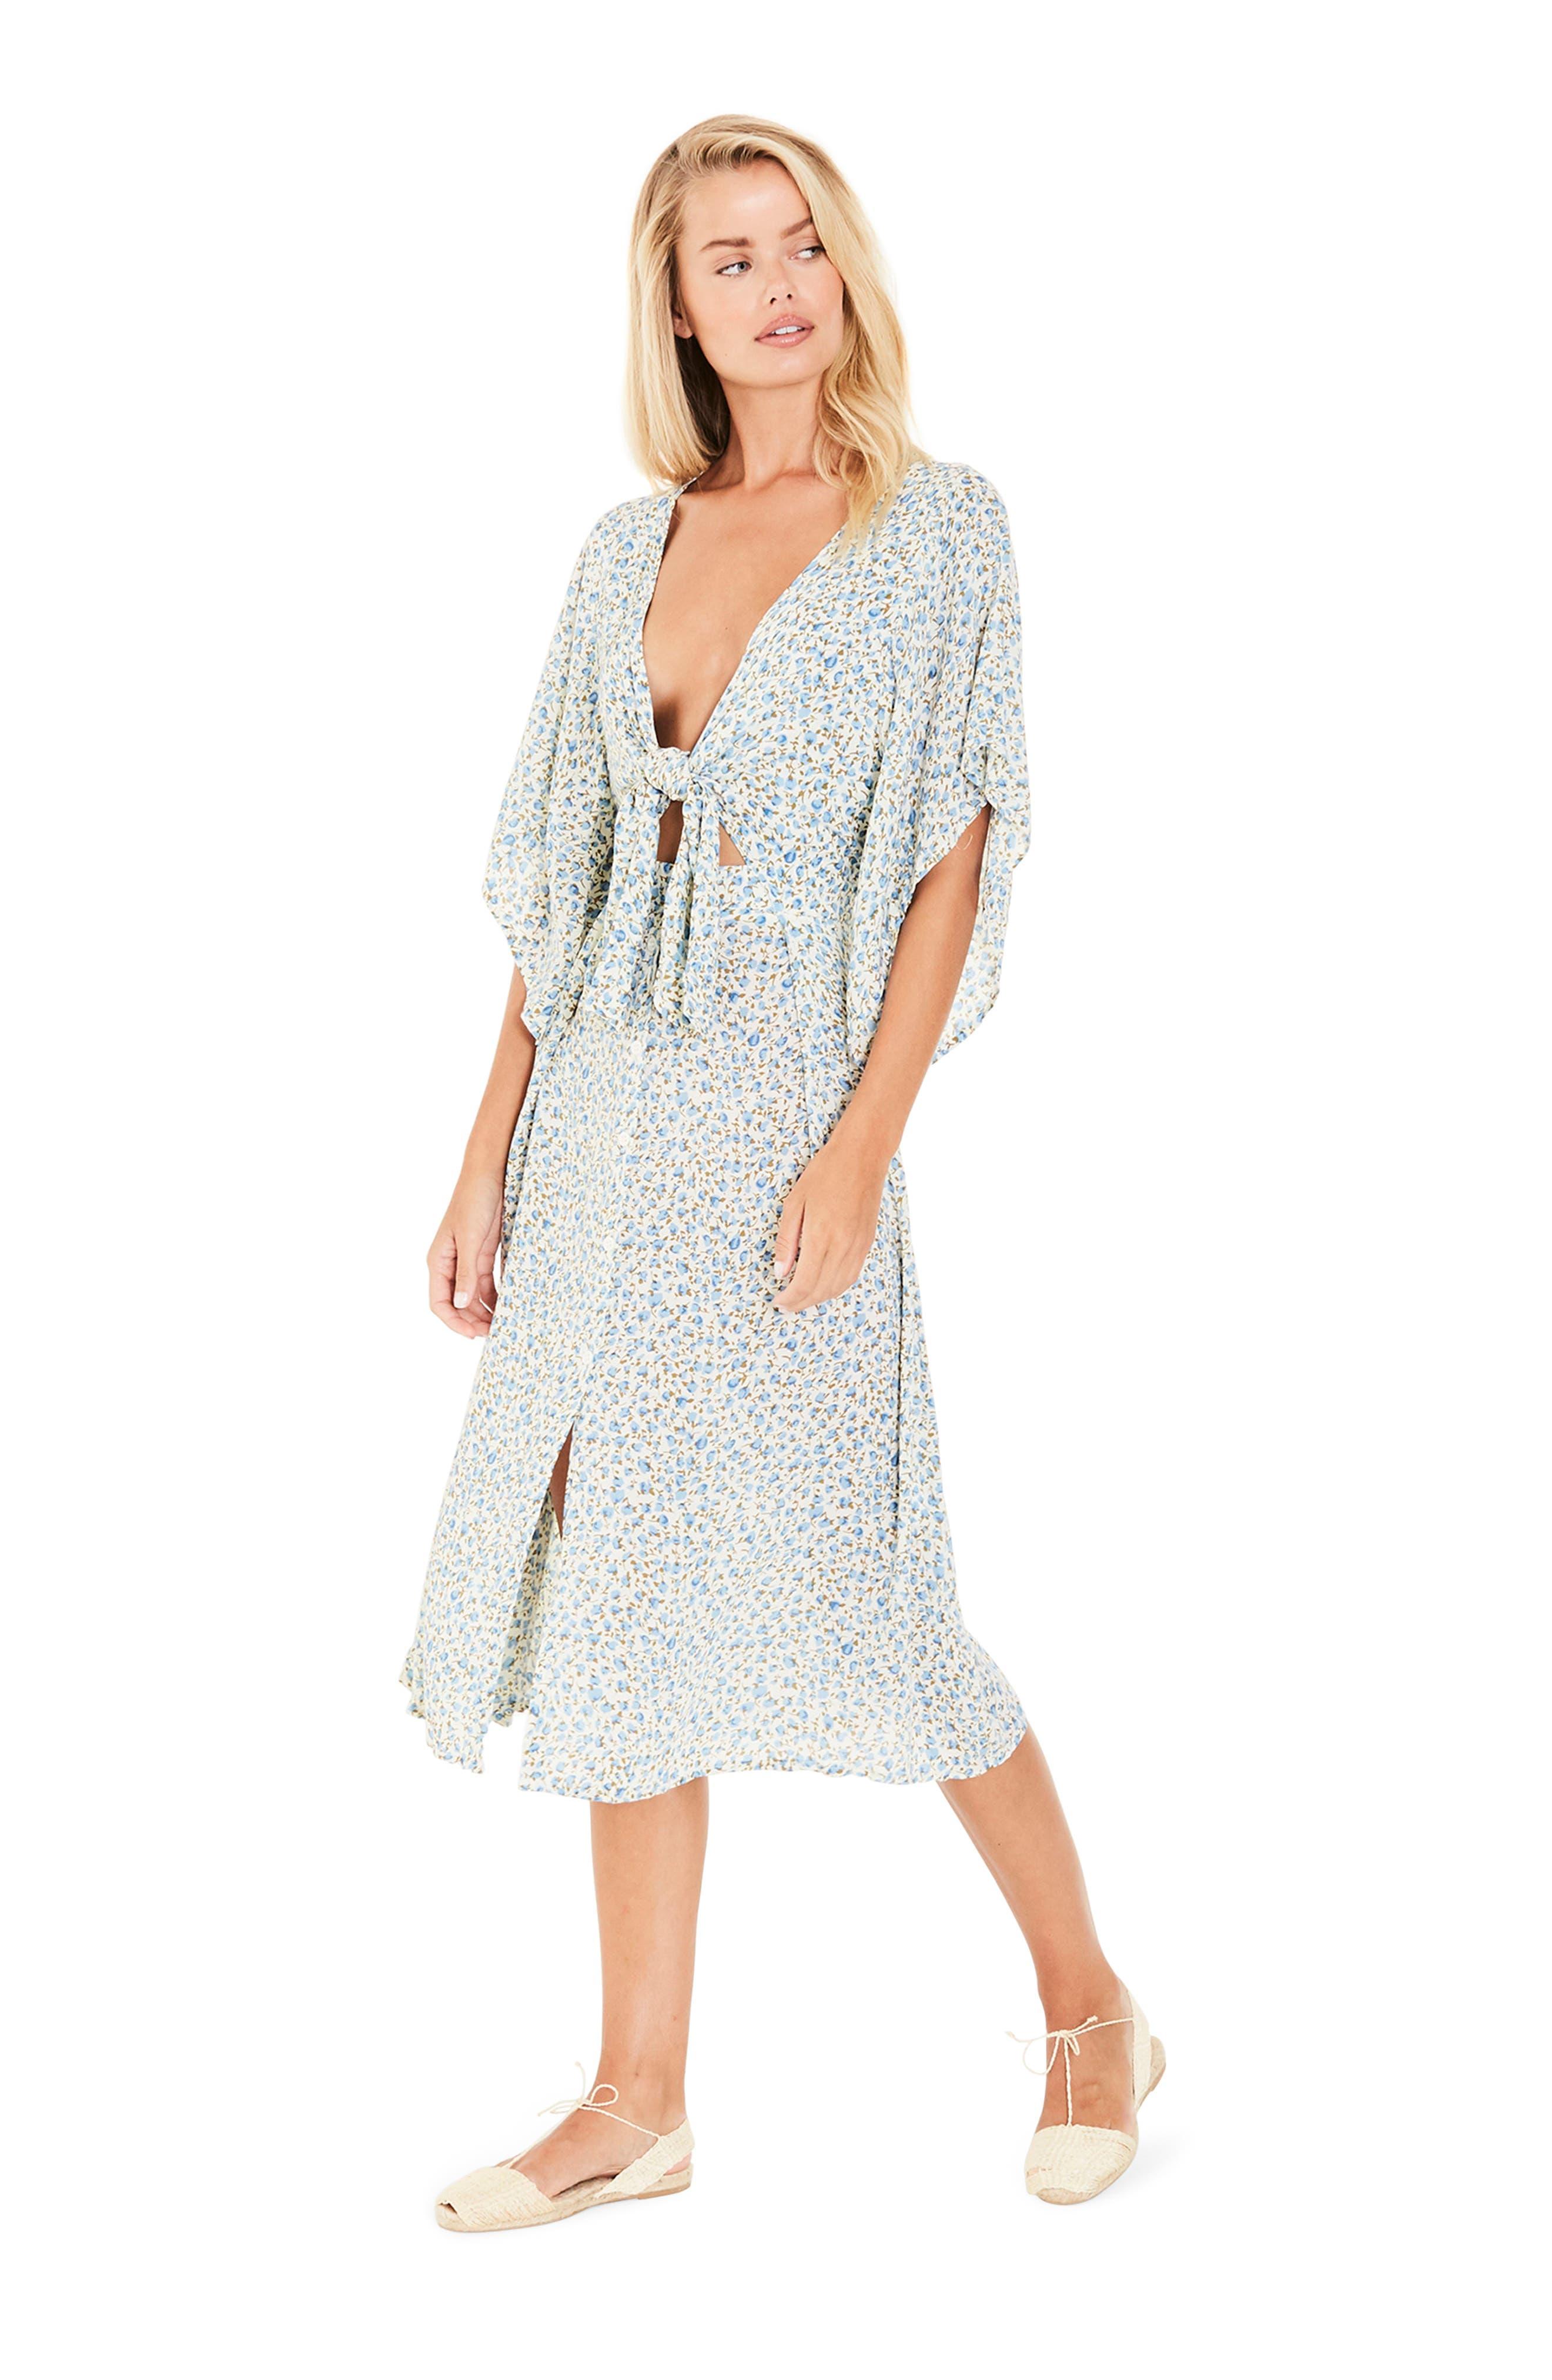 Massimo Tie Front Midi Dress,                             Alternate thumbnail 2, color,                             Dahlia Floral Print